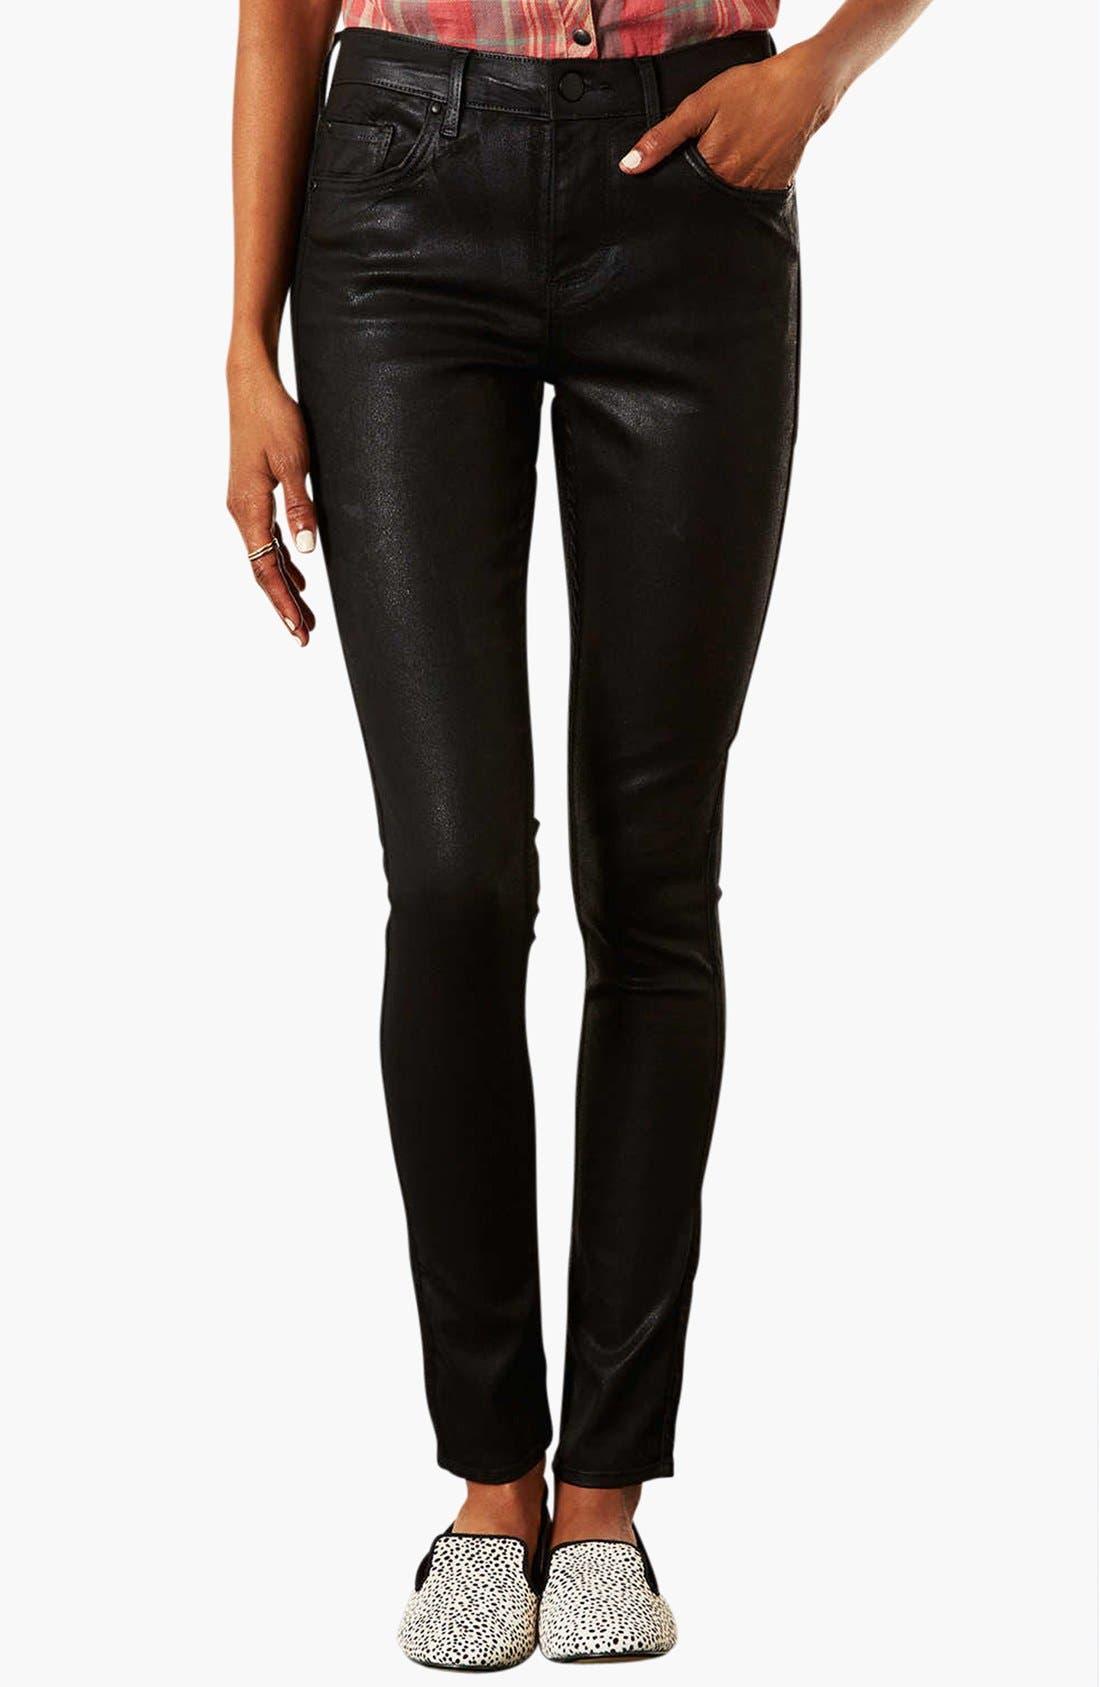 Alternate Image 1 Selected - Topshop Moto 'Leigh' Coated Skinny Jeans (Black)